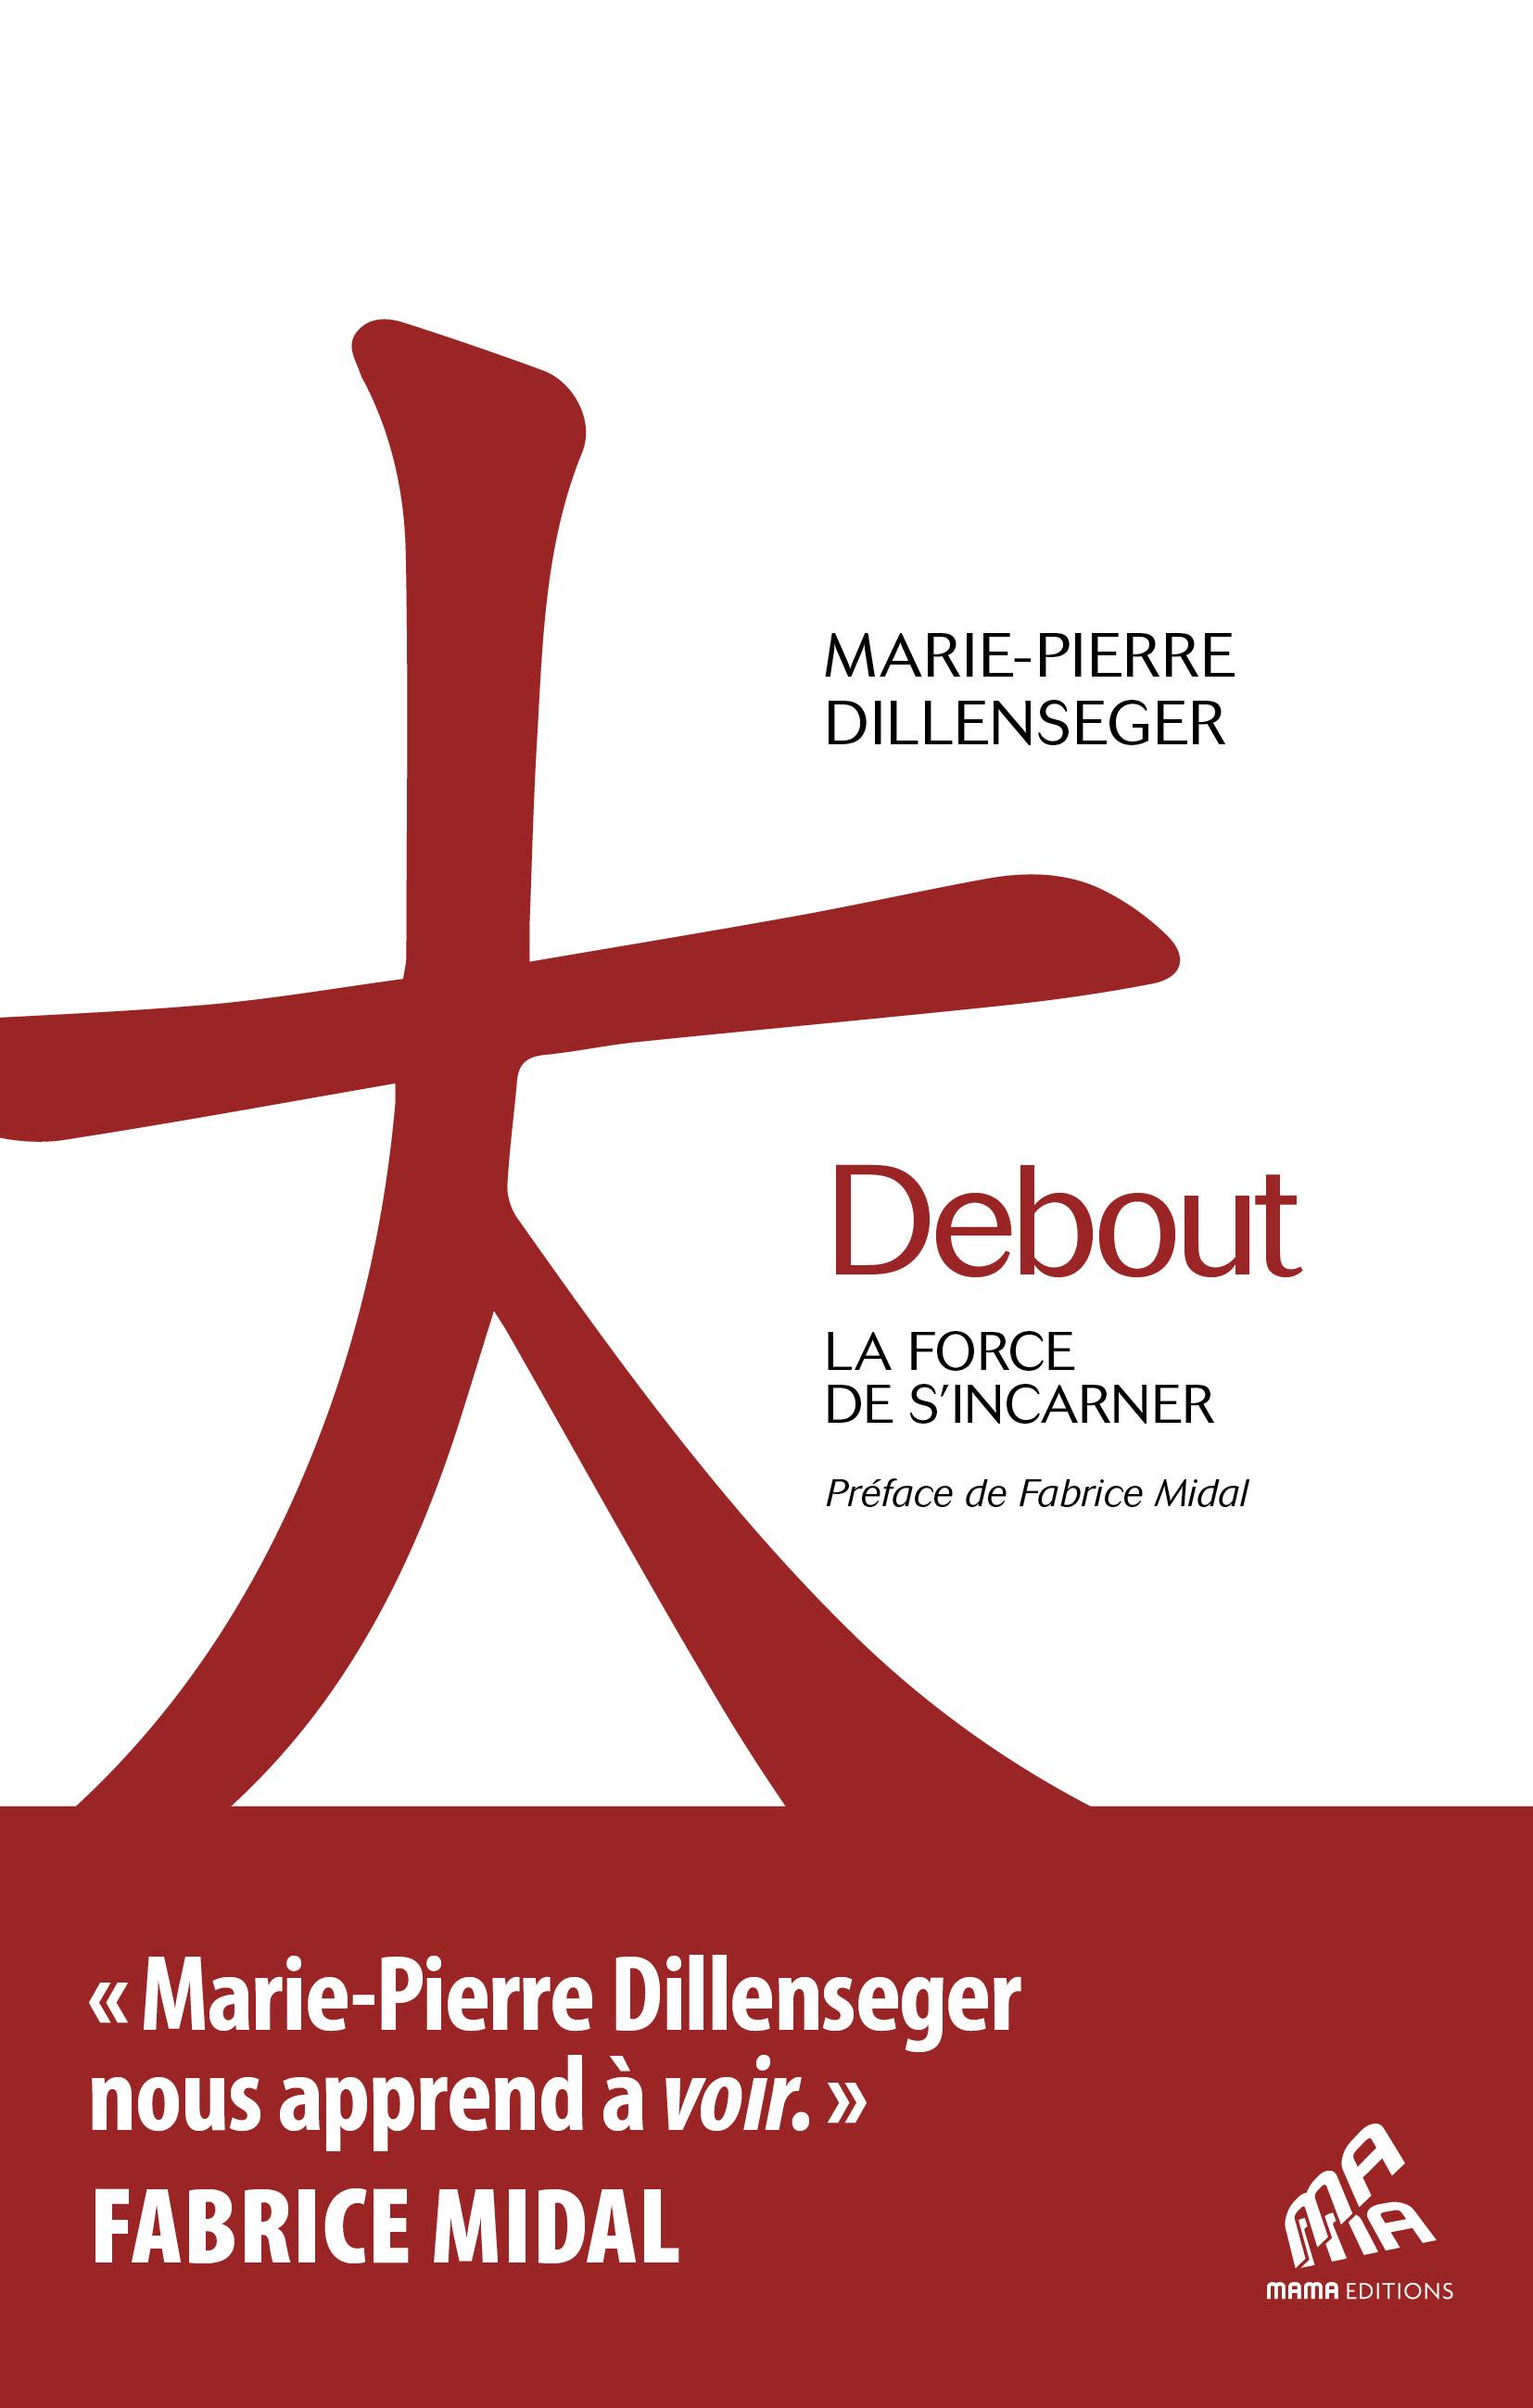 MARIE-PIERRE DILLENSEGER